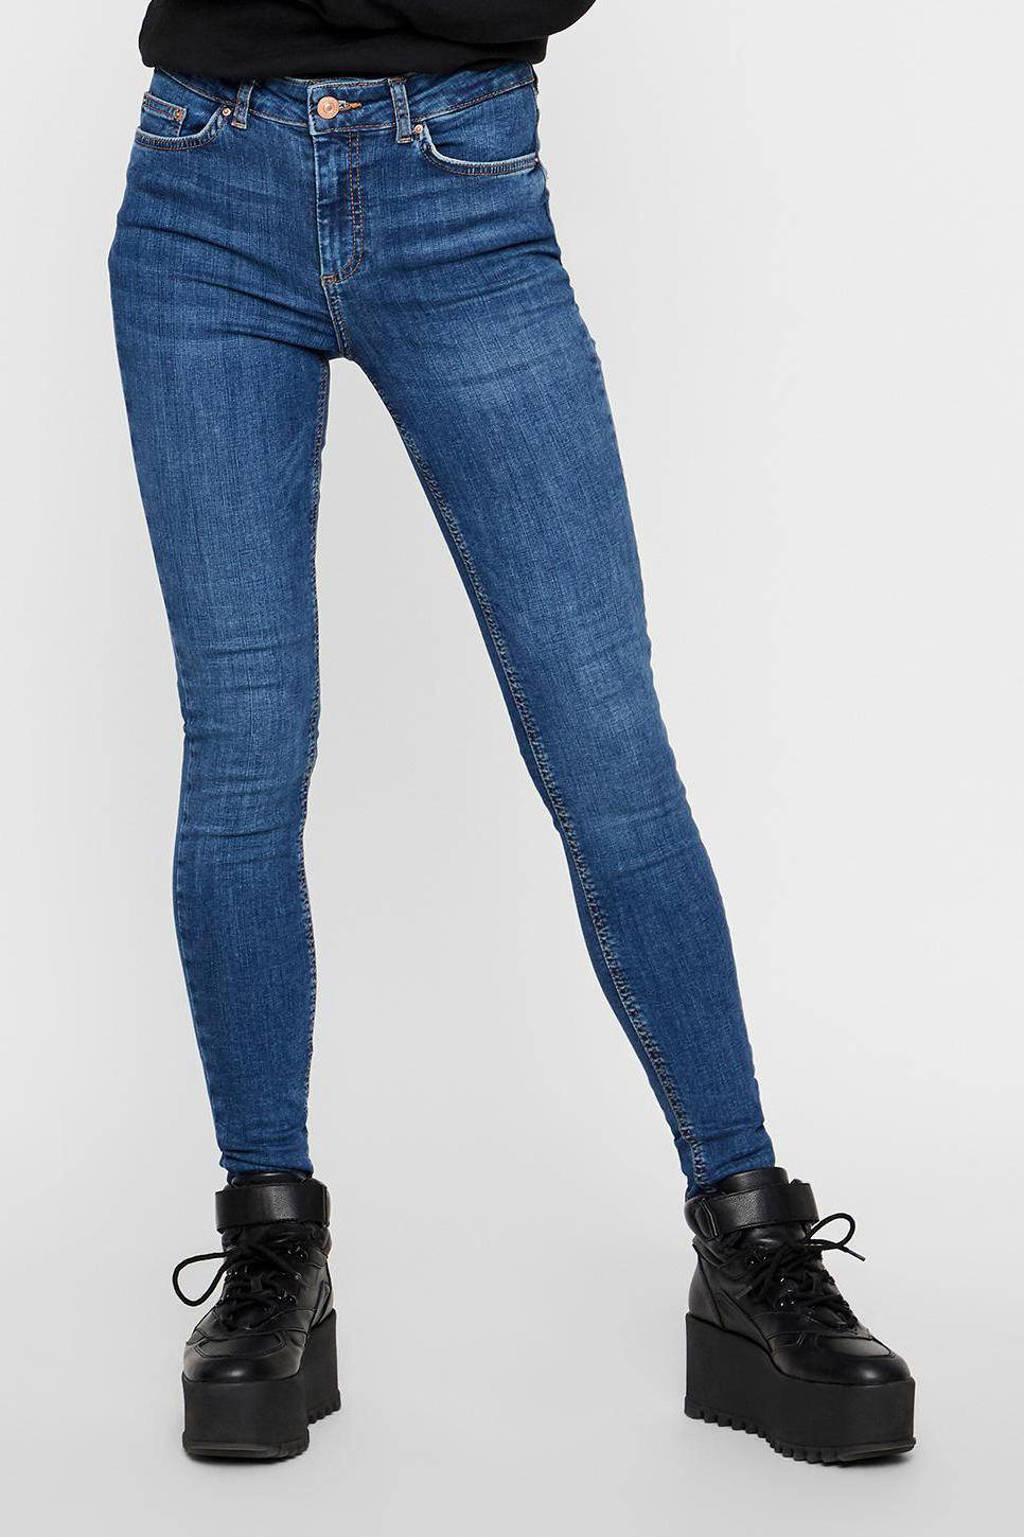 PIECES high waist skinny jeans PCDELLY medium blue denim, Blauw